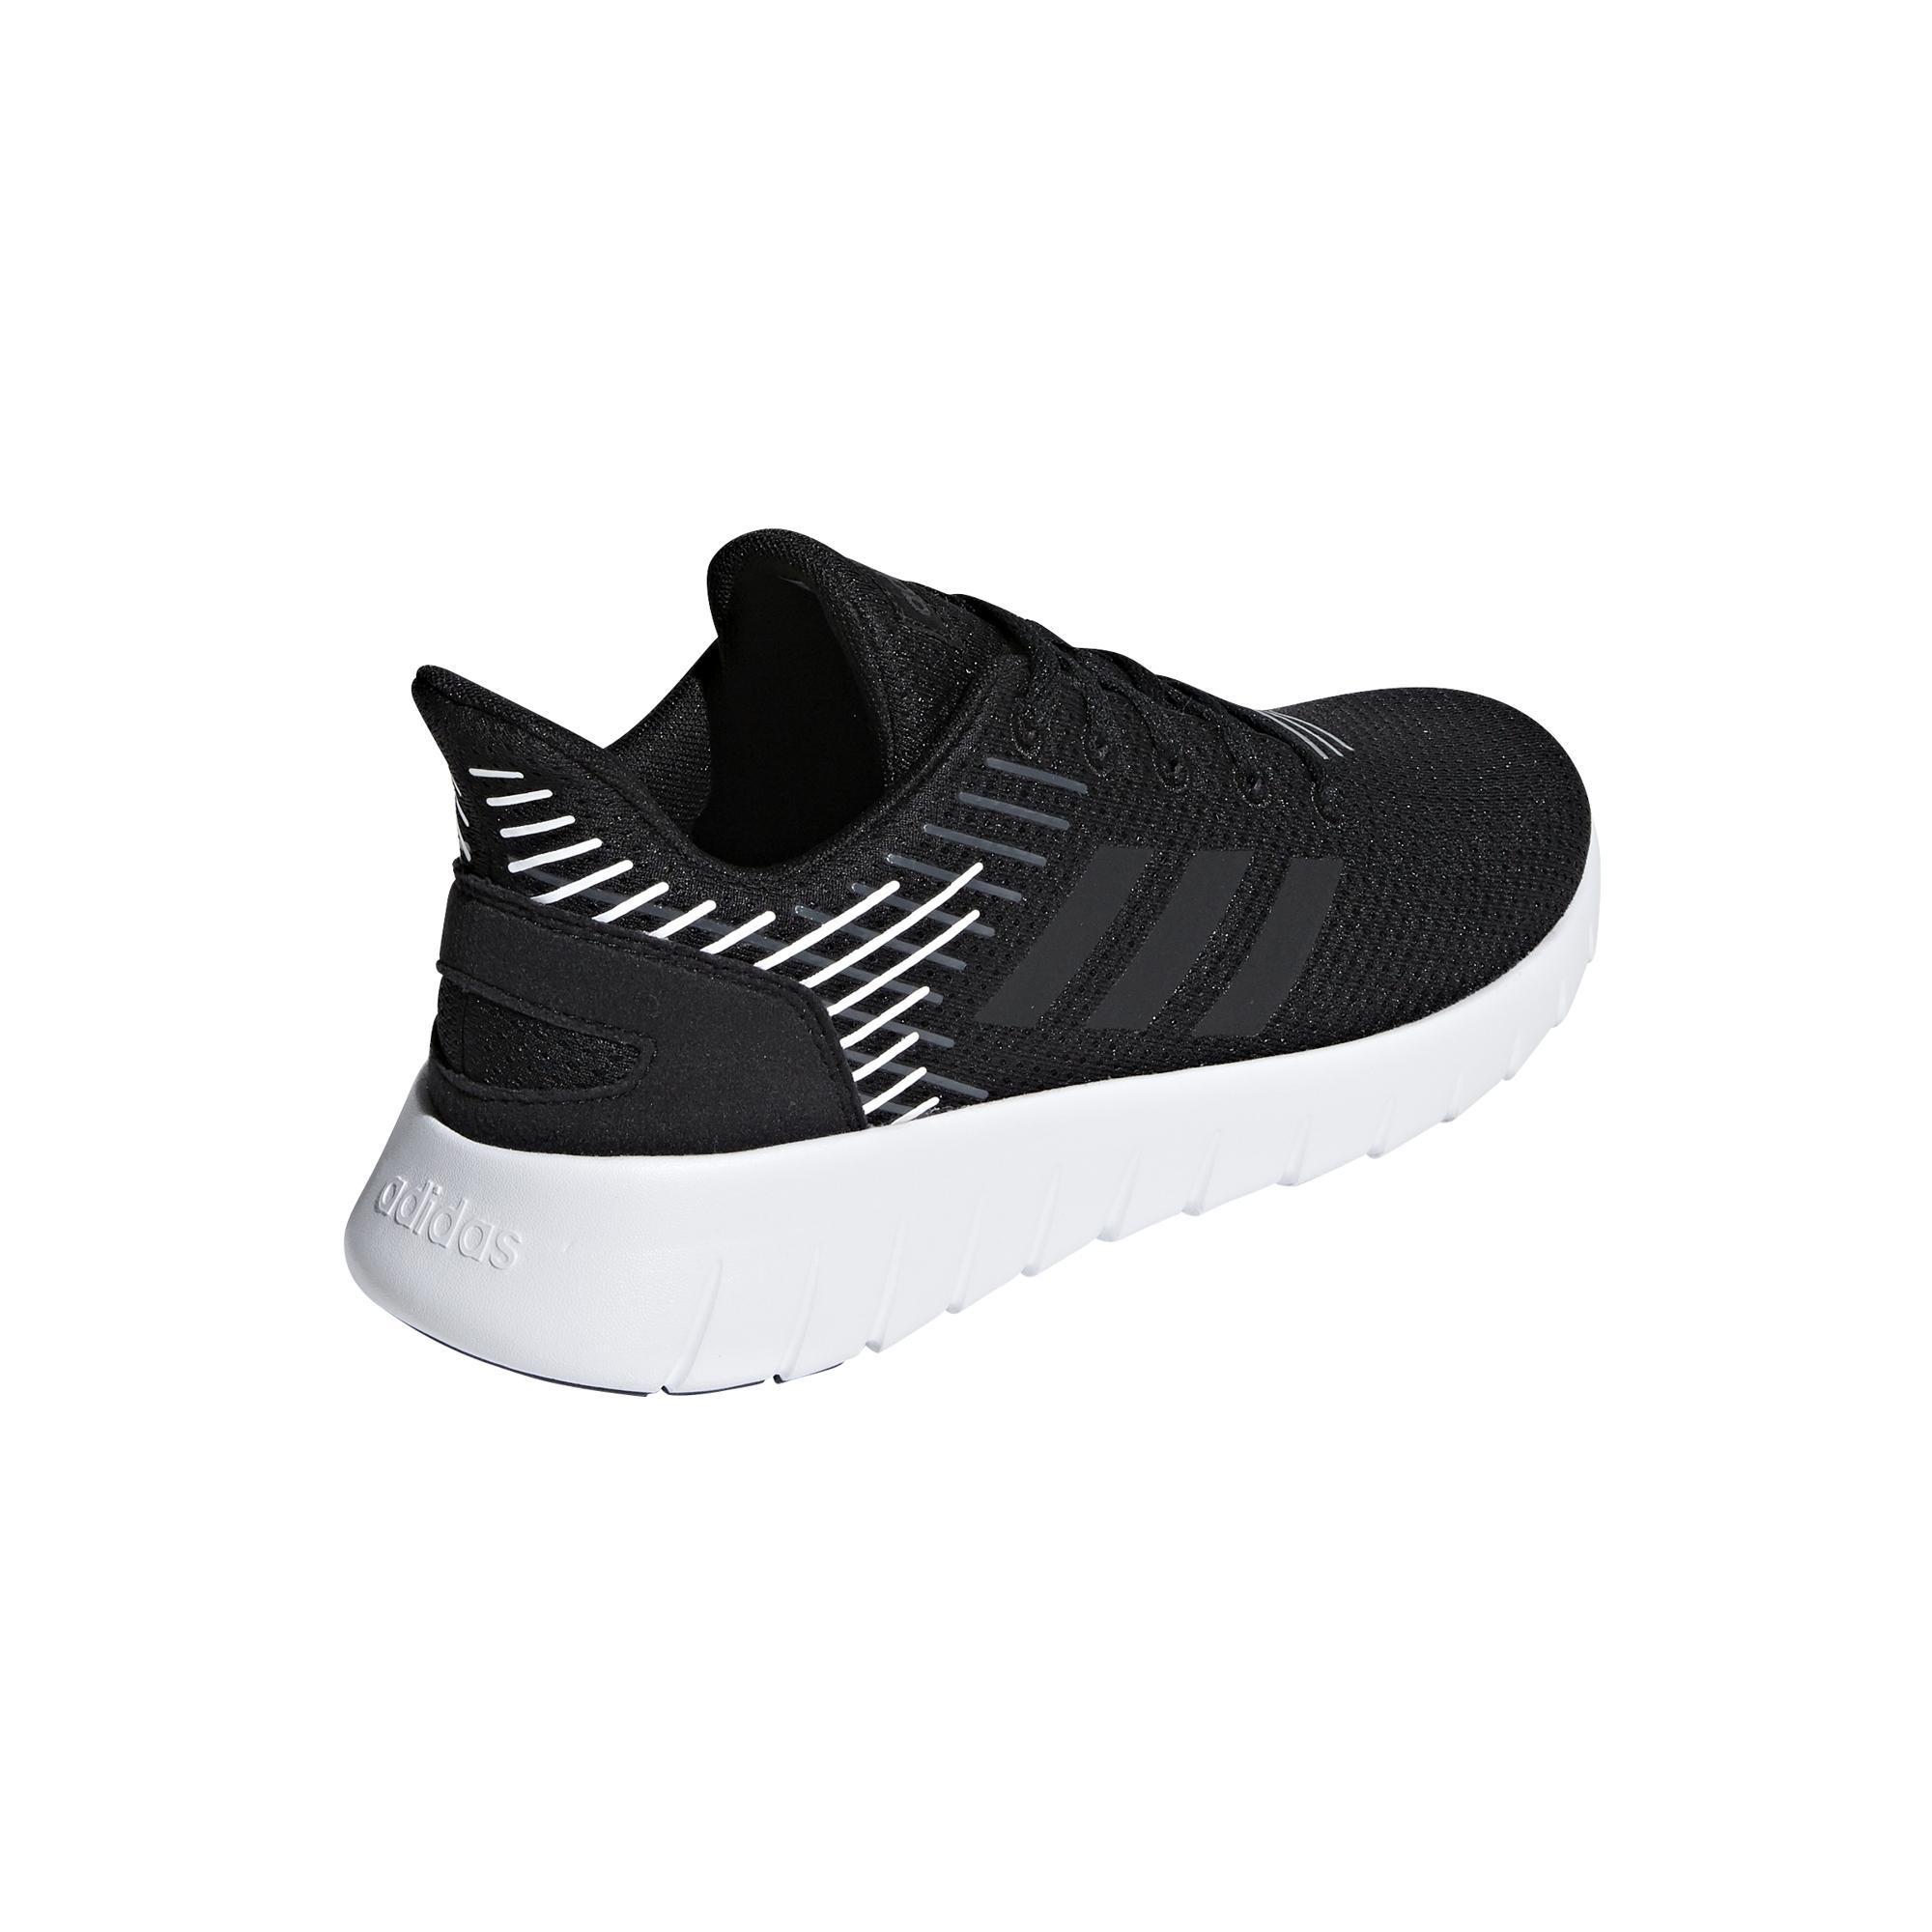 Chaussures femme adidas Asweerun